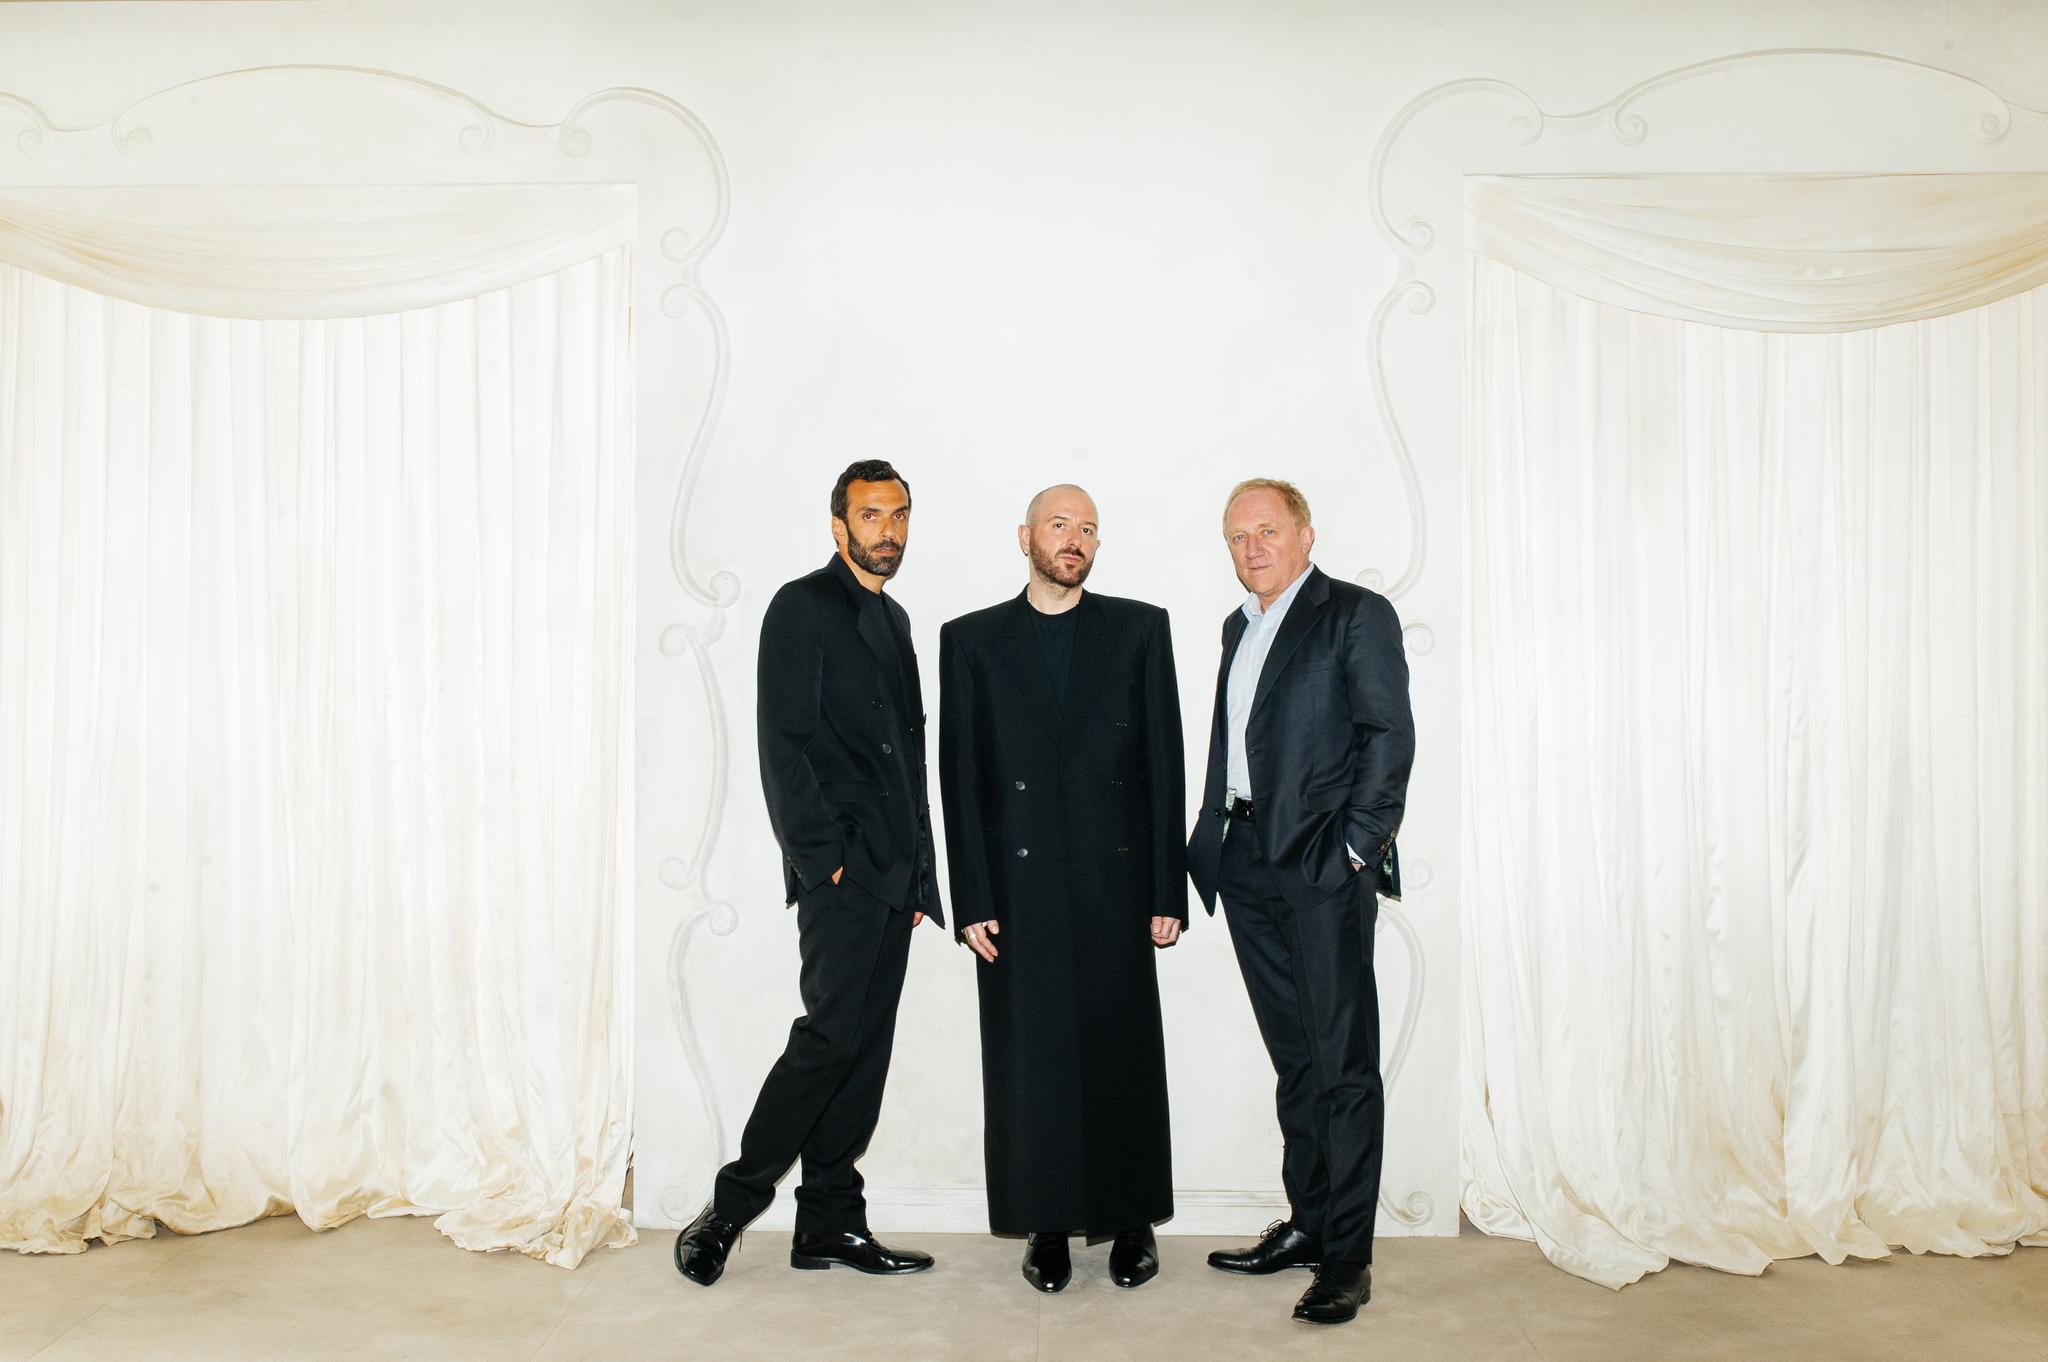 Demna Gvasalia Is Fusing Heritage, Modernity in Balenciaga Couture – WWD